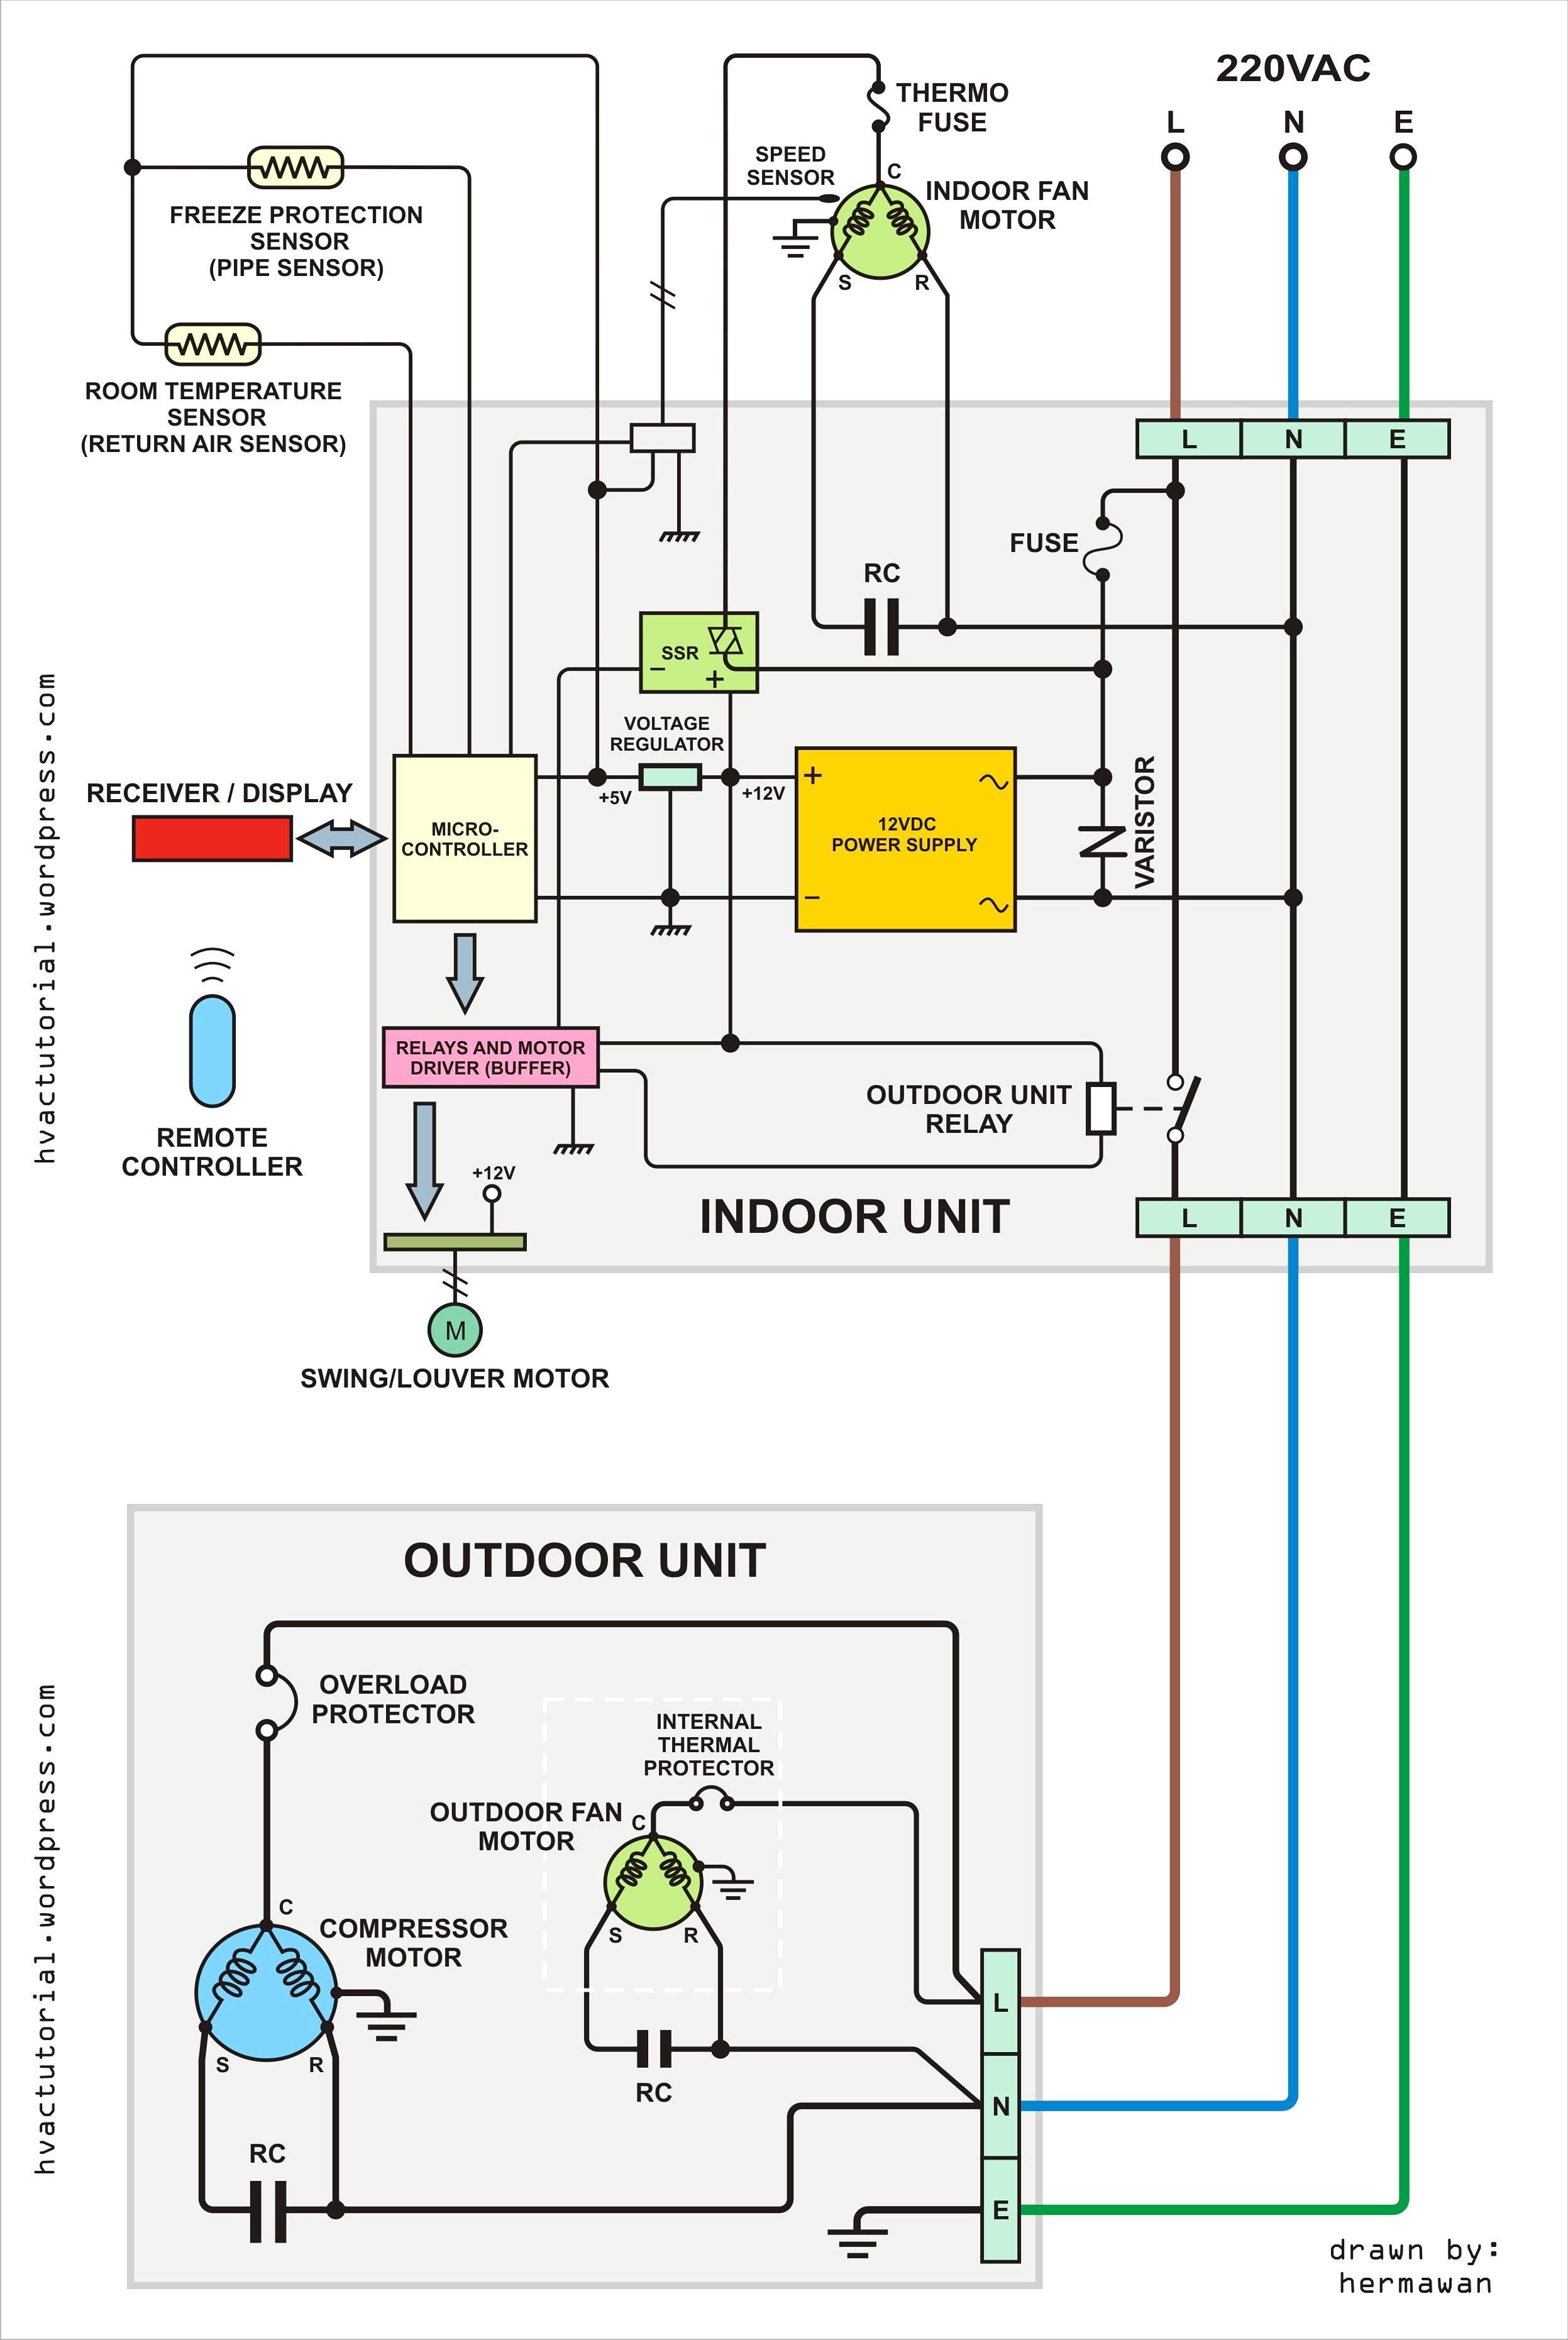 Honeywell L8148E Aquastat Wiring Diagram On | Manual E-Books - Honeywell Aquastat L8148E Wiring Diagram